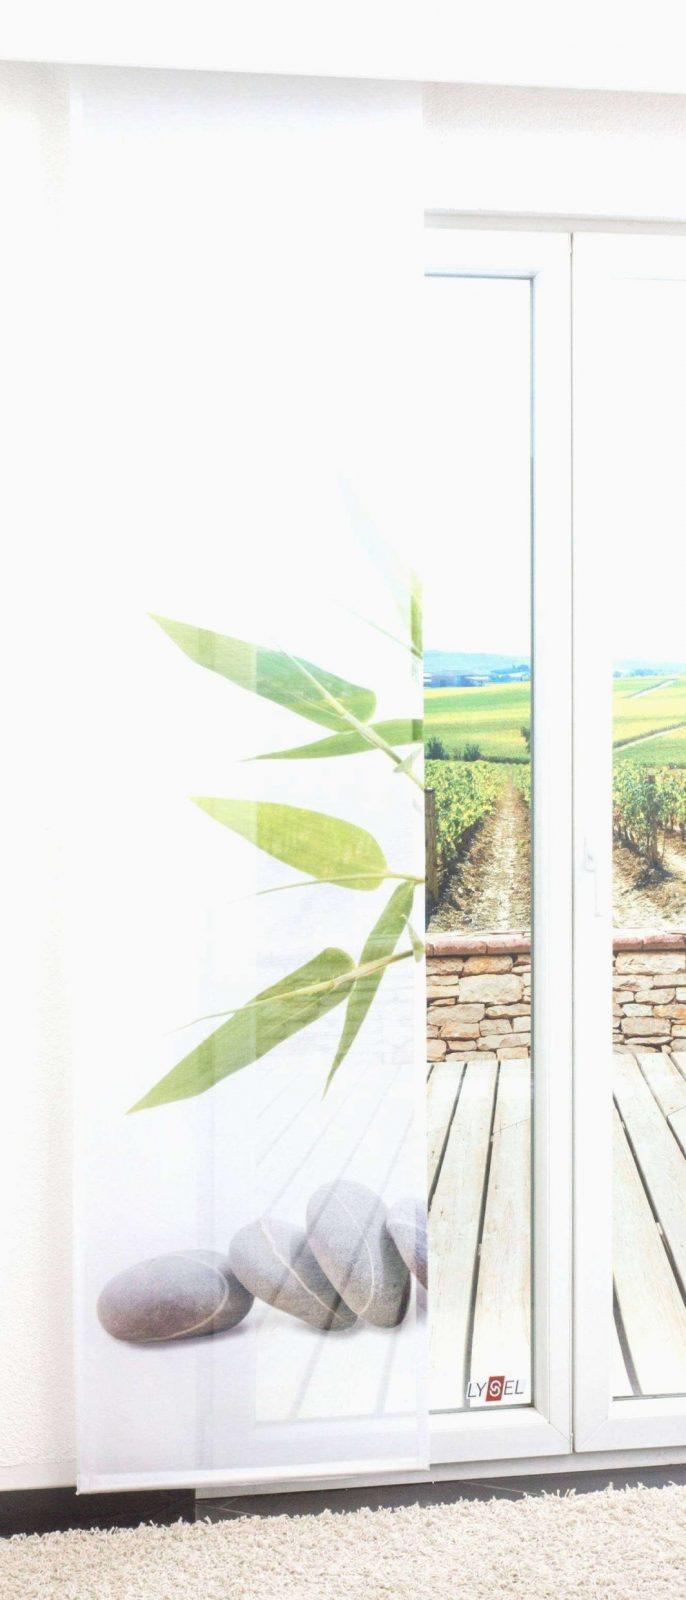 33 Einzigartig Deko Ideen Selber Machen Garten Design Von von Holzfiguren Garten Selber Machen Photo